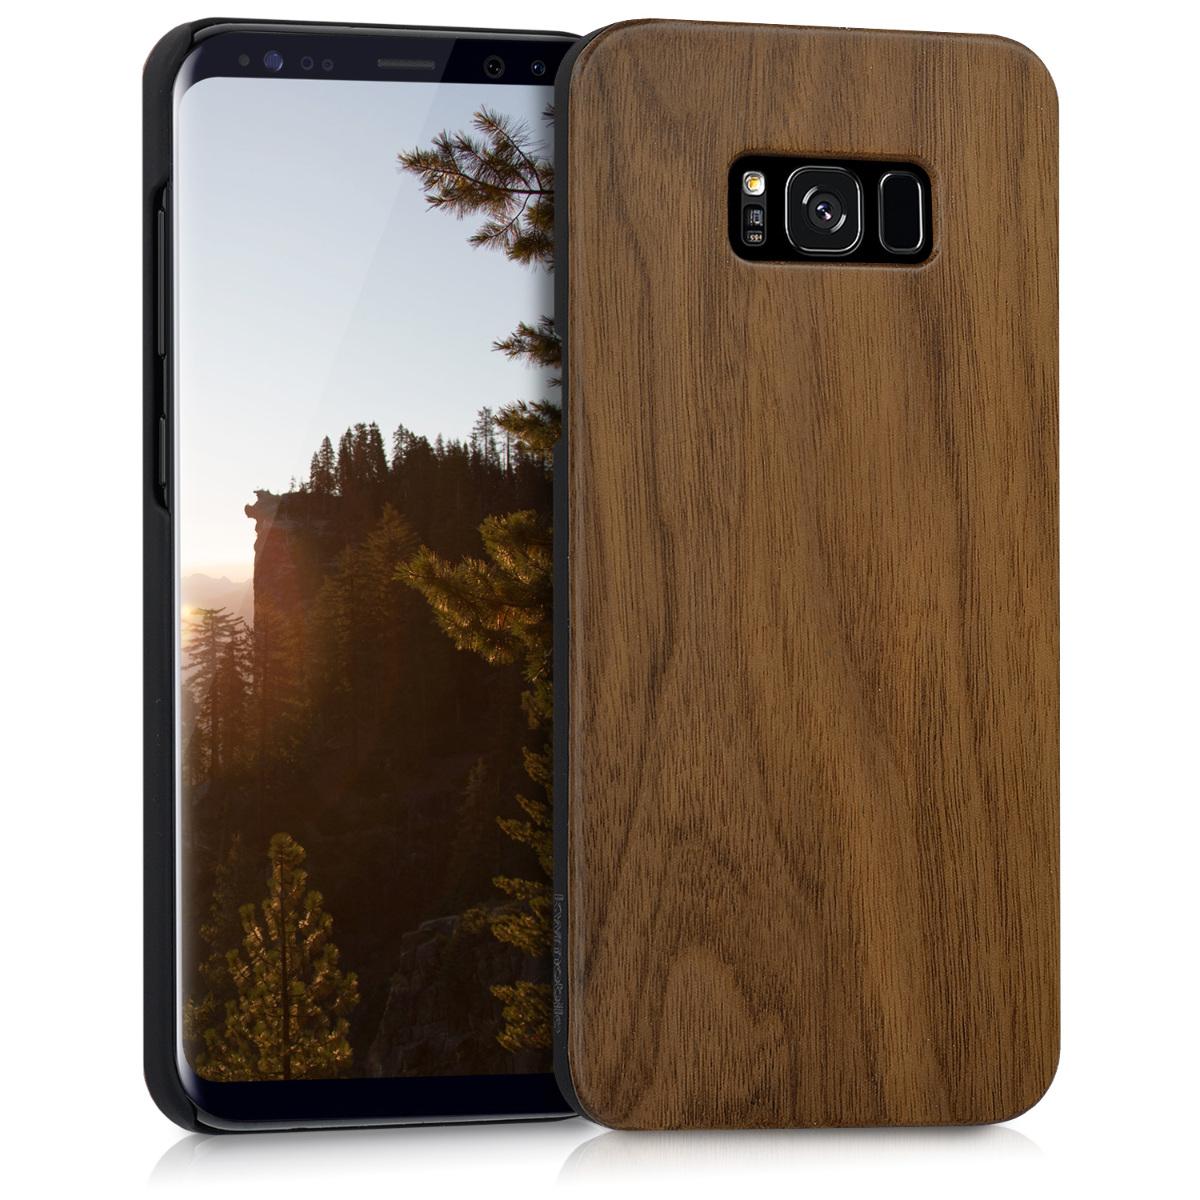 KW Σκληρή Ξύλινη θήκη Samsung Galaxy S8 Plus Wood Case  (41004.18)